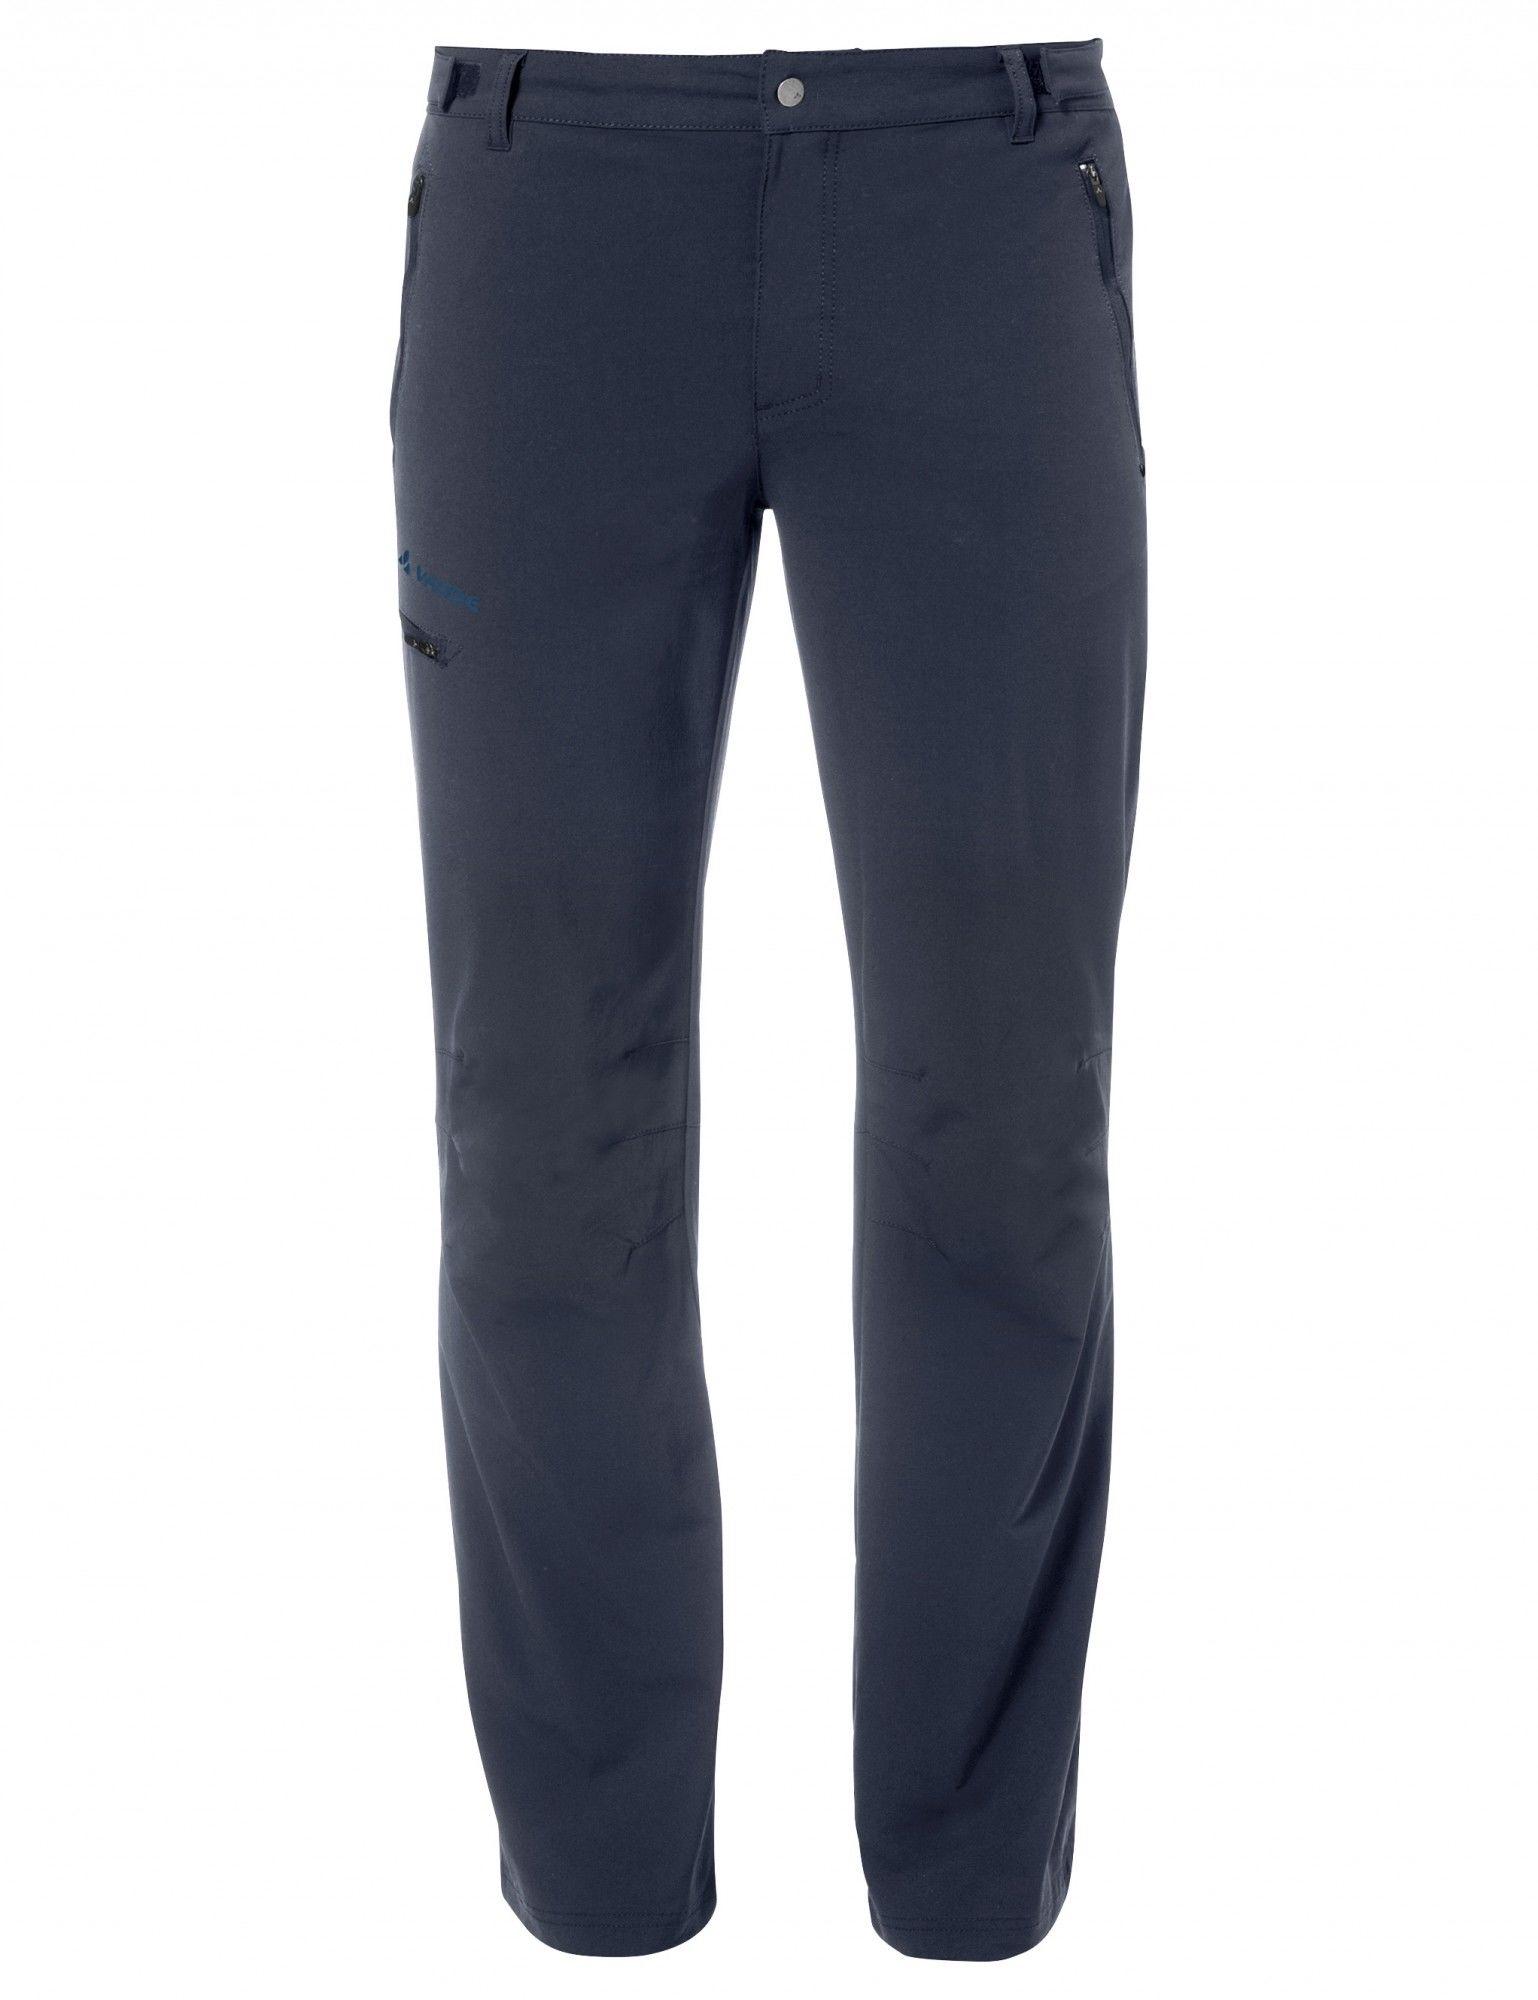 Vaude Mens Farley Stretch Pants II | Größe 50 - Regular,52 - Regular,50 - Shor